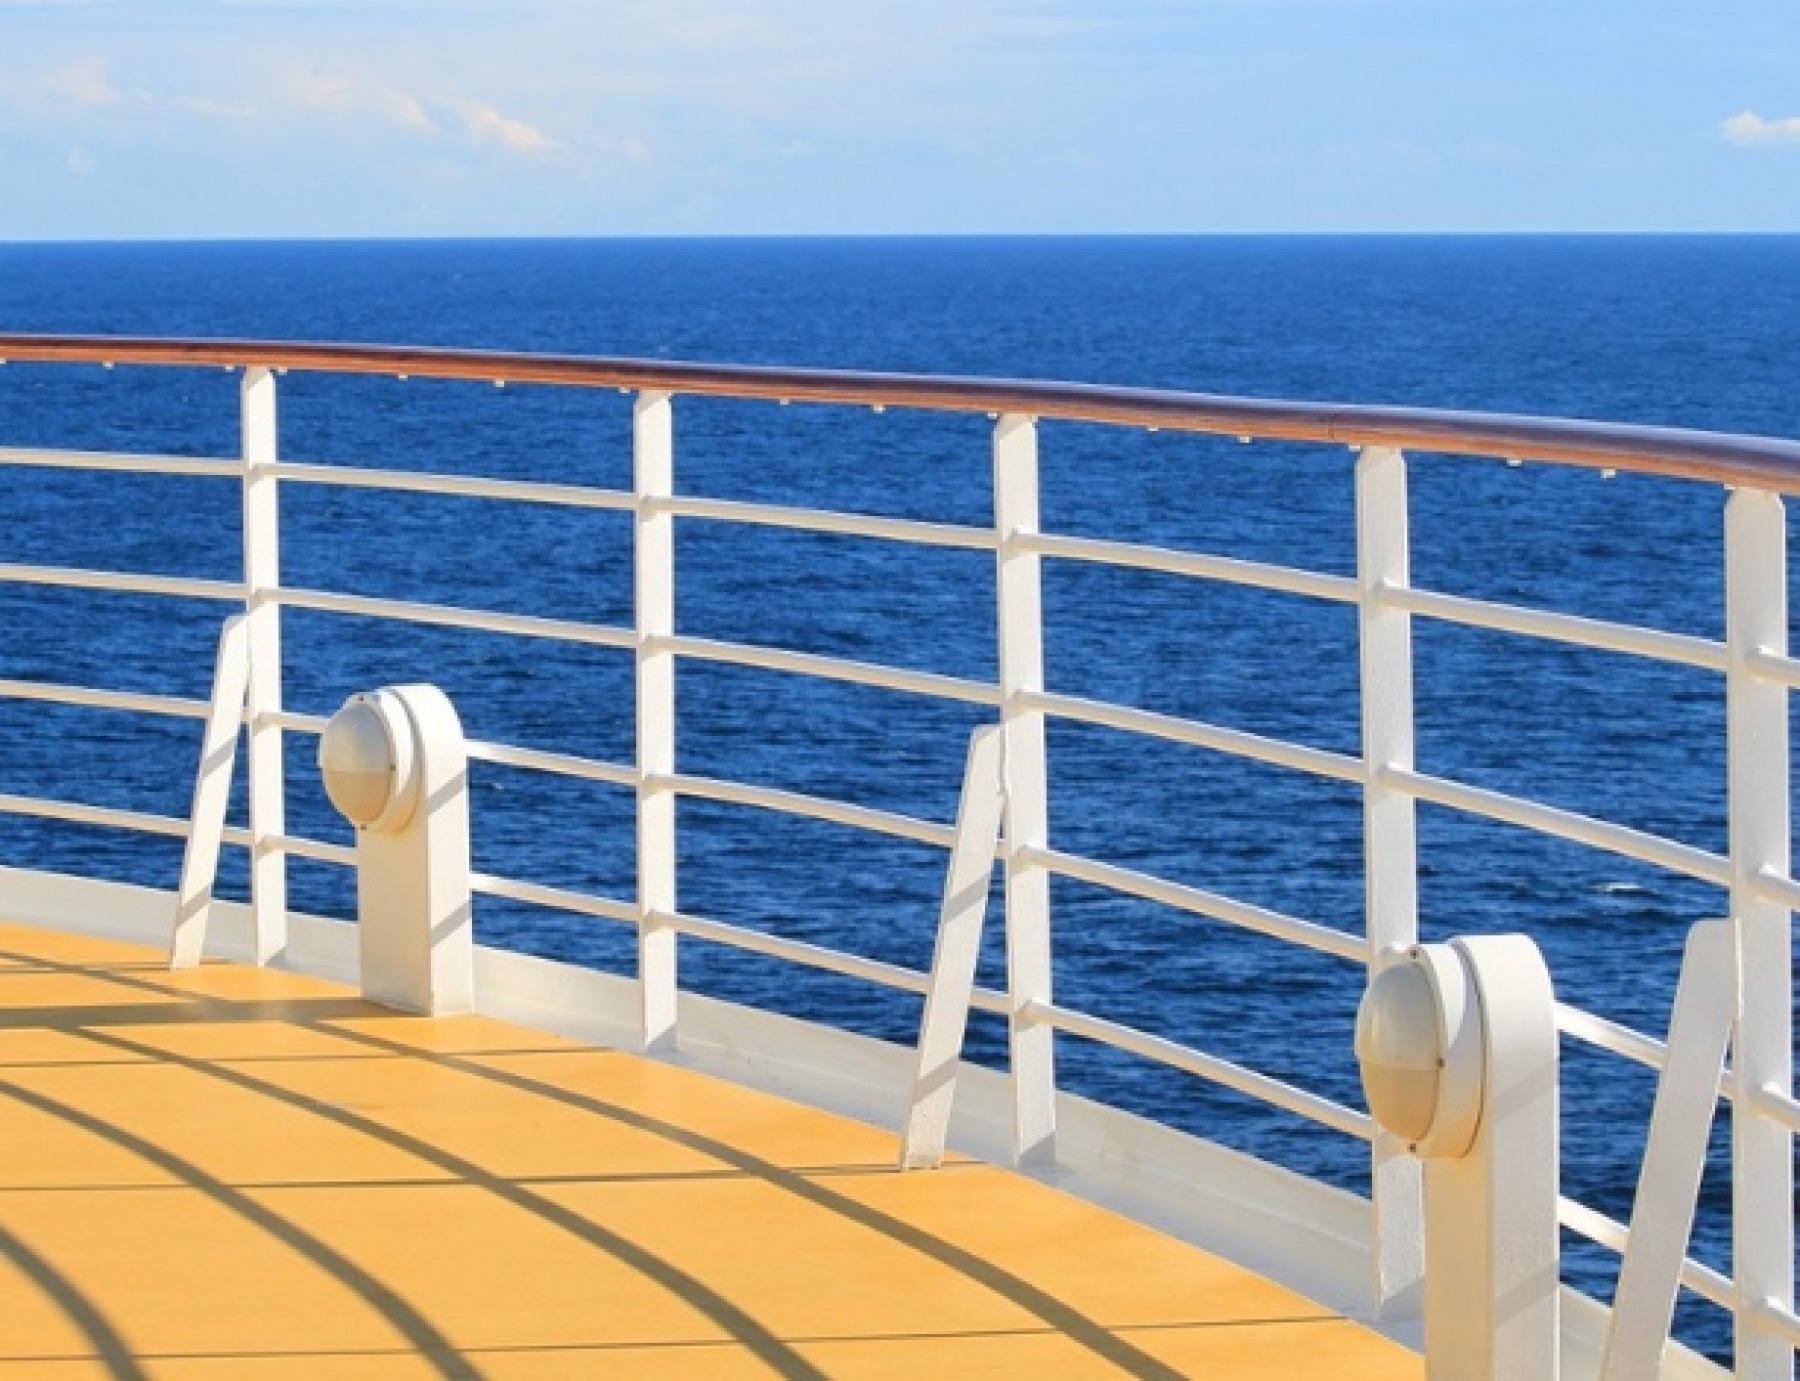 Carnival Cruise Lines Carnival Dream Interiorchefs-table-5.jpg